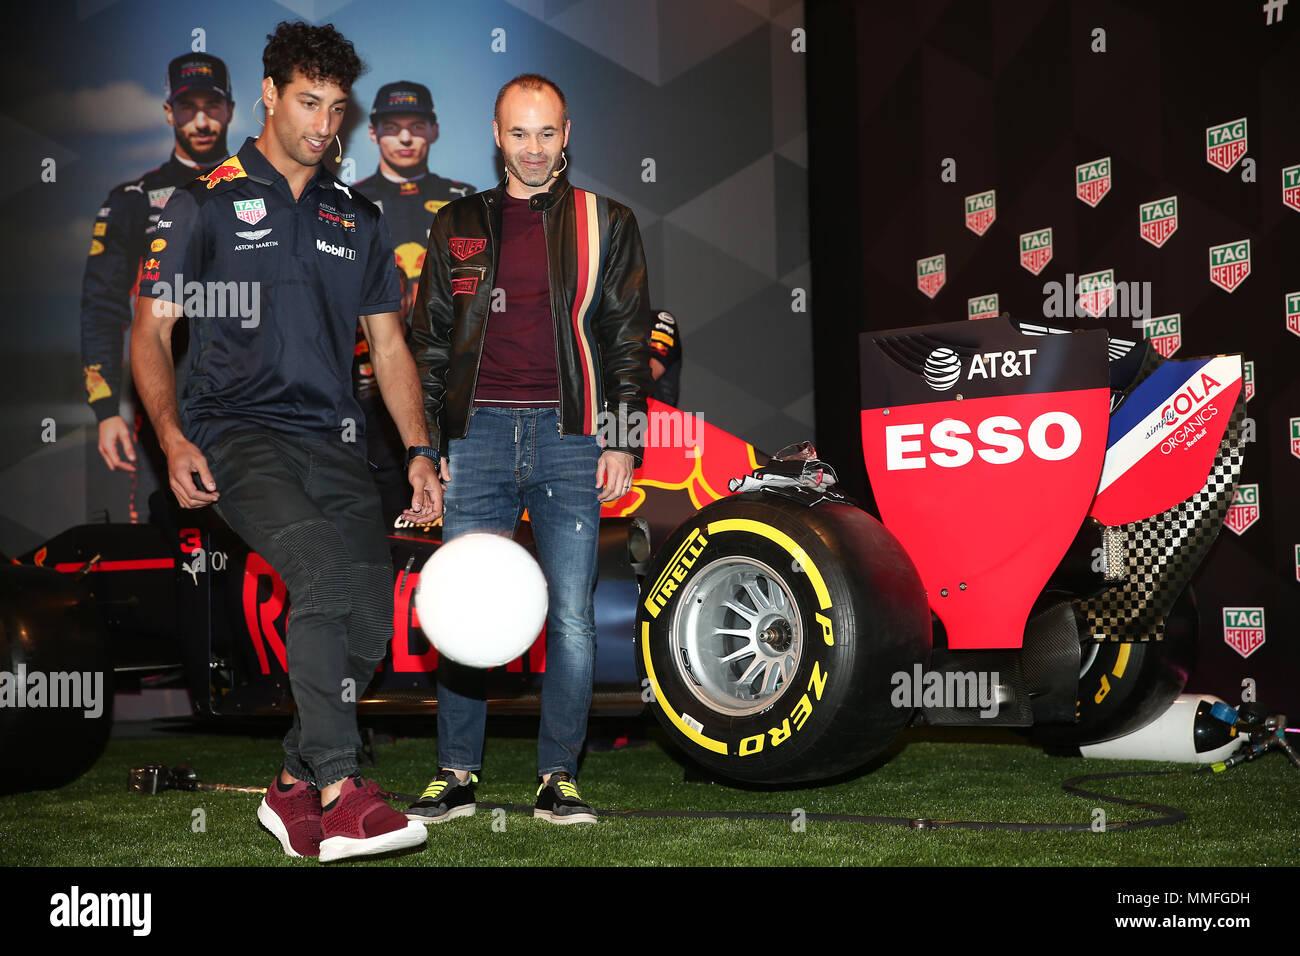 Barcelona -10th May 2018- SPAIN: Daniel Ricciardo and Andres Iniesta during the Aston Martin Red Bull Racing TAG Heuer, in Barcelona, on 5th May 2018. Photo: Joan Valls/Urbanandsport/Cordon Press - Stock Image